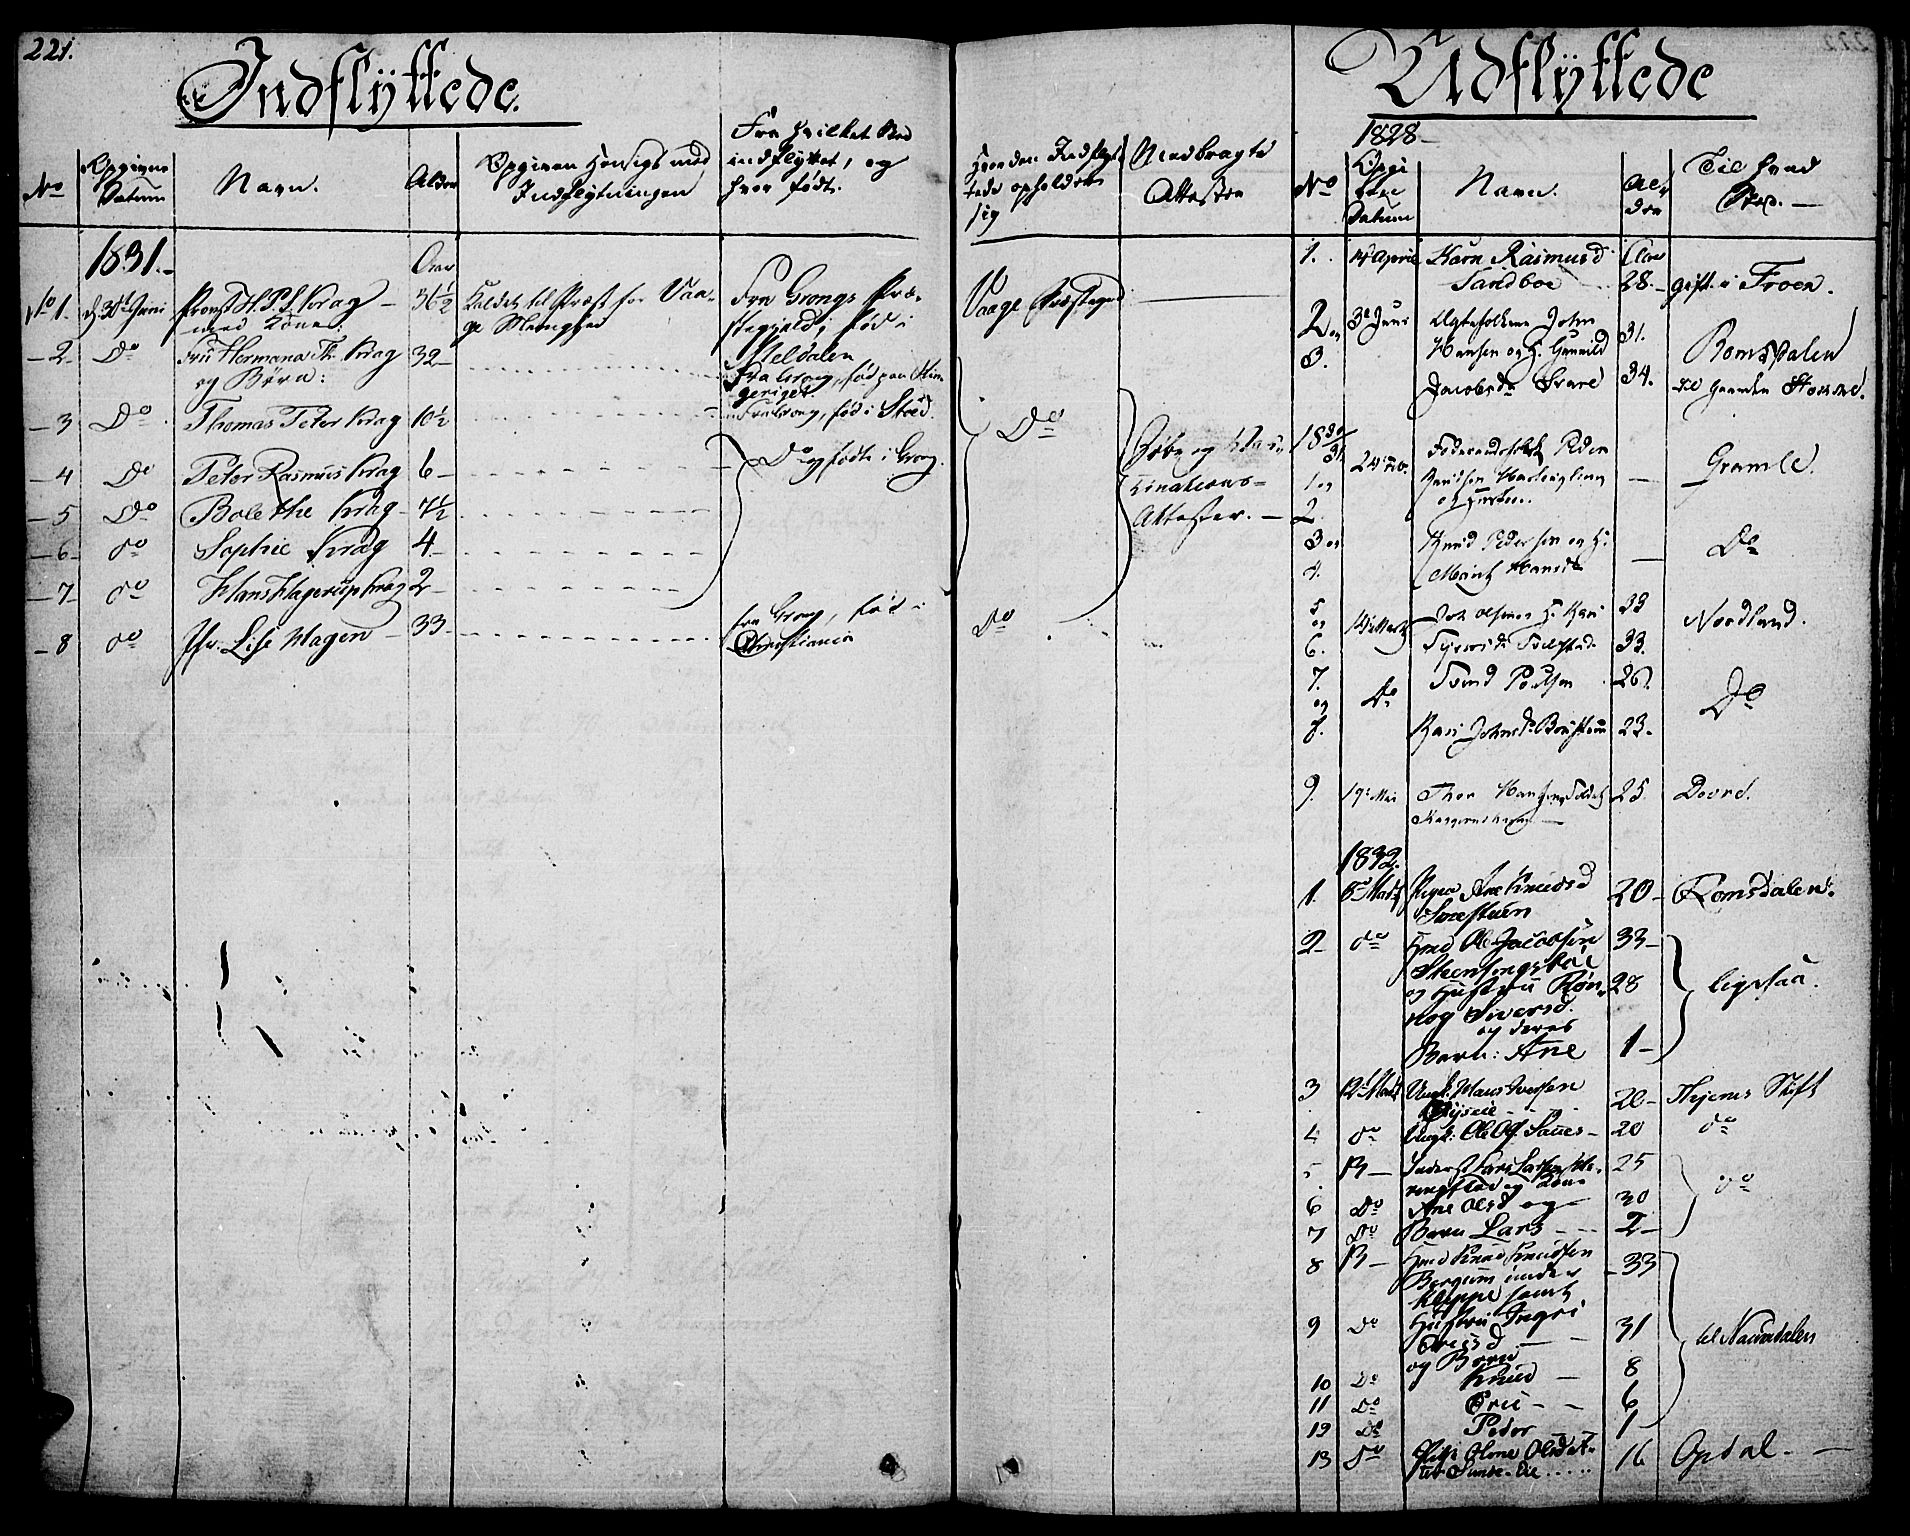 SAH, Vågå prestekontor, Ministerialbok nr. 4 /1, 1827-1842, s. 221